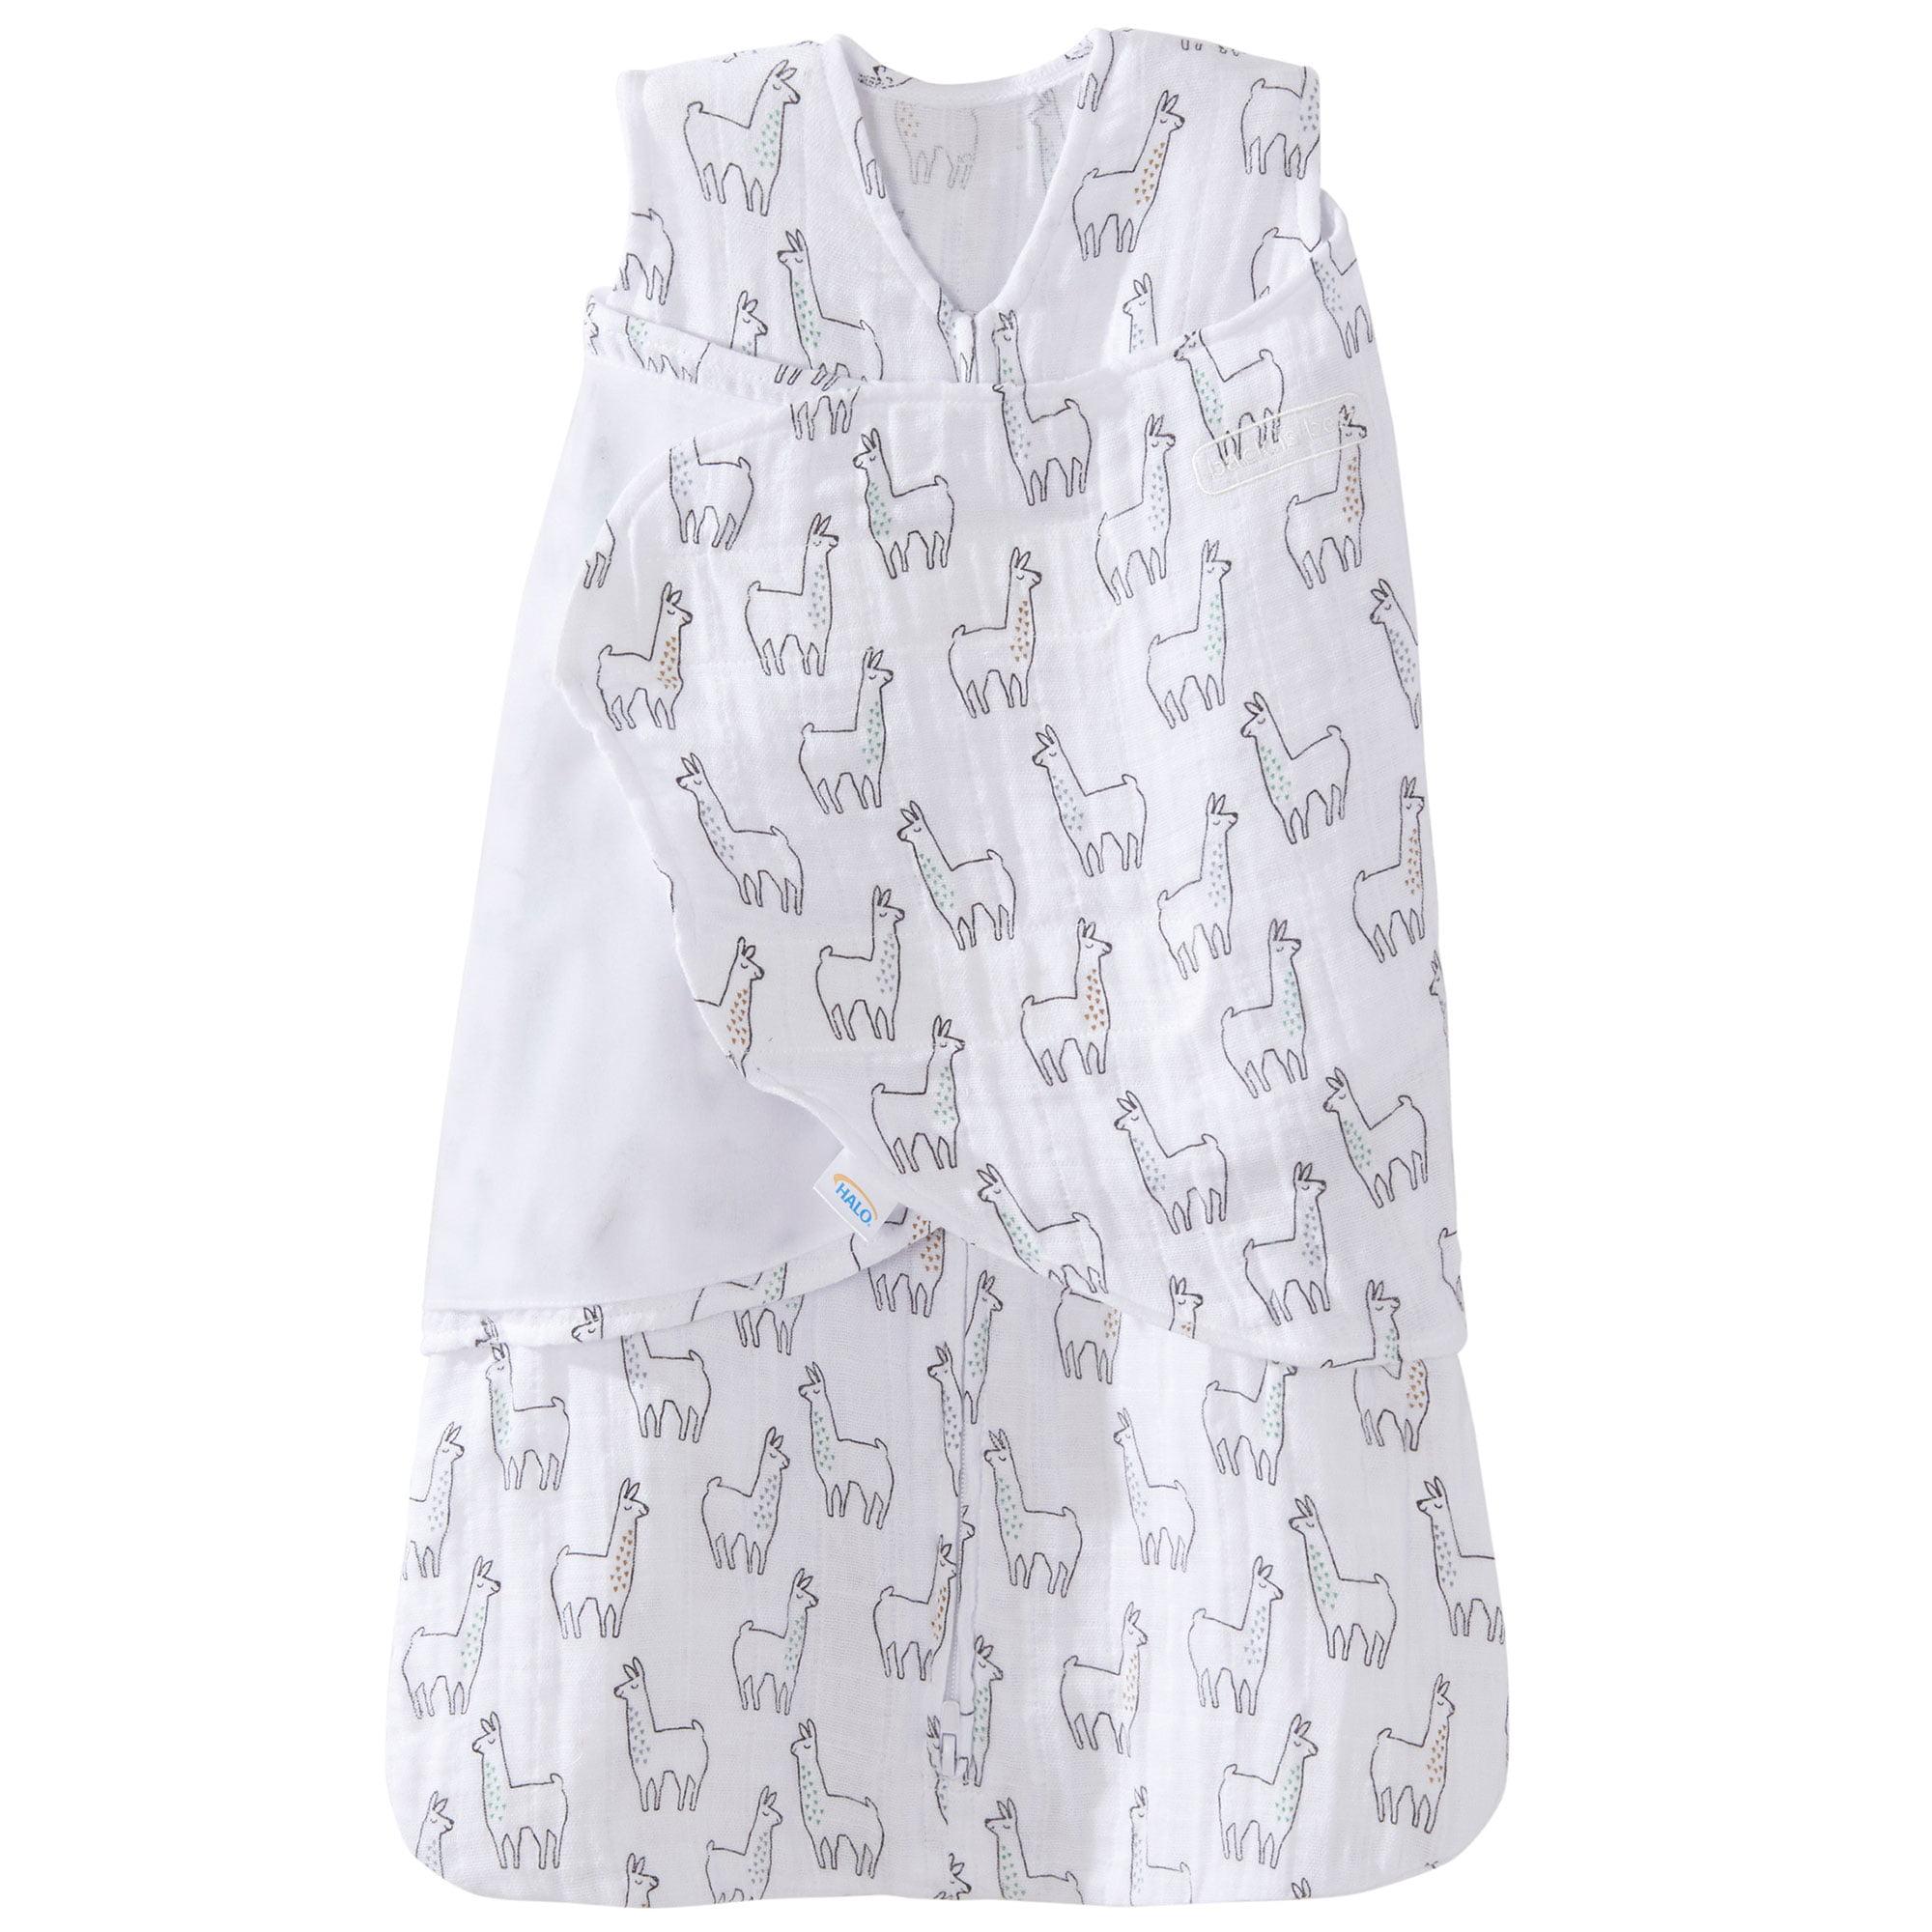 Halo 100% Cotton Muslin Baby Sleepsack Swaddle Wearable Blanket, Llama Print, Small